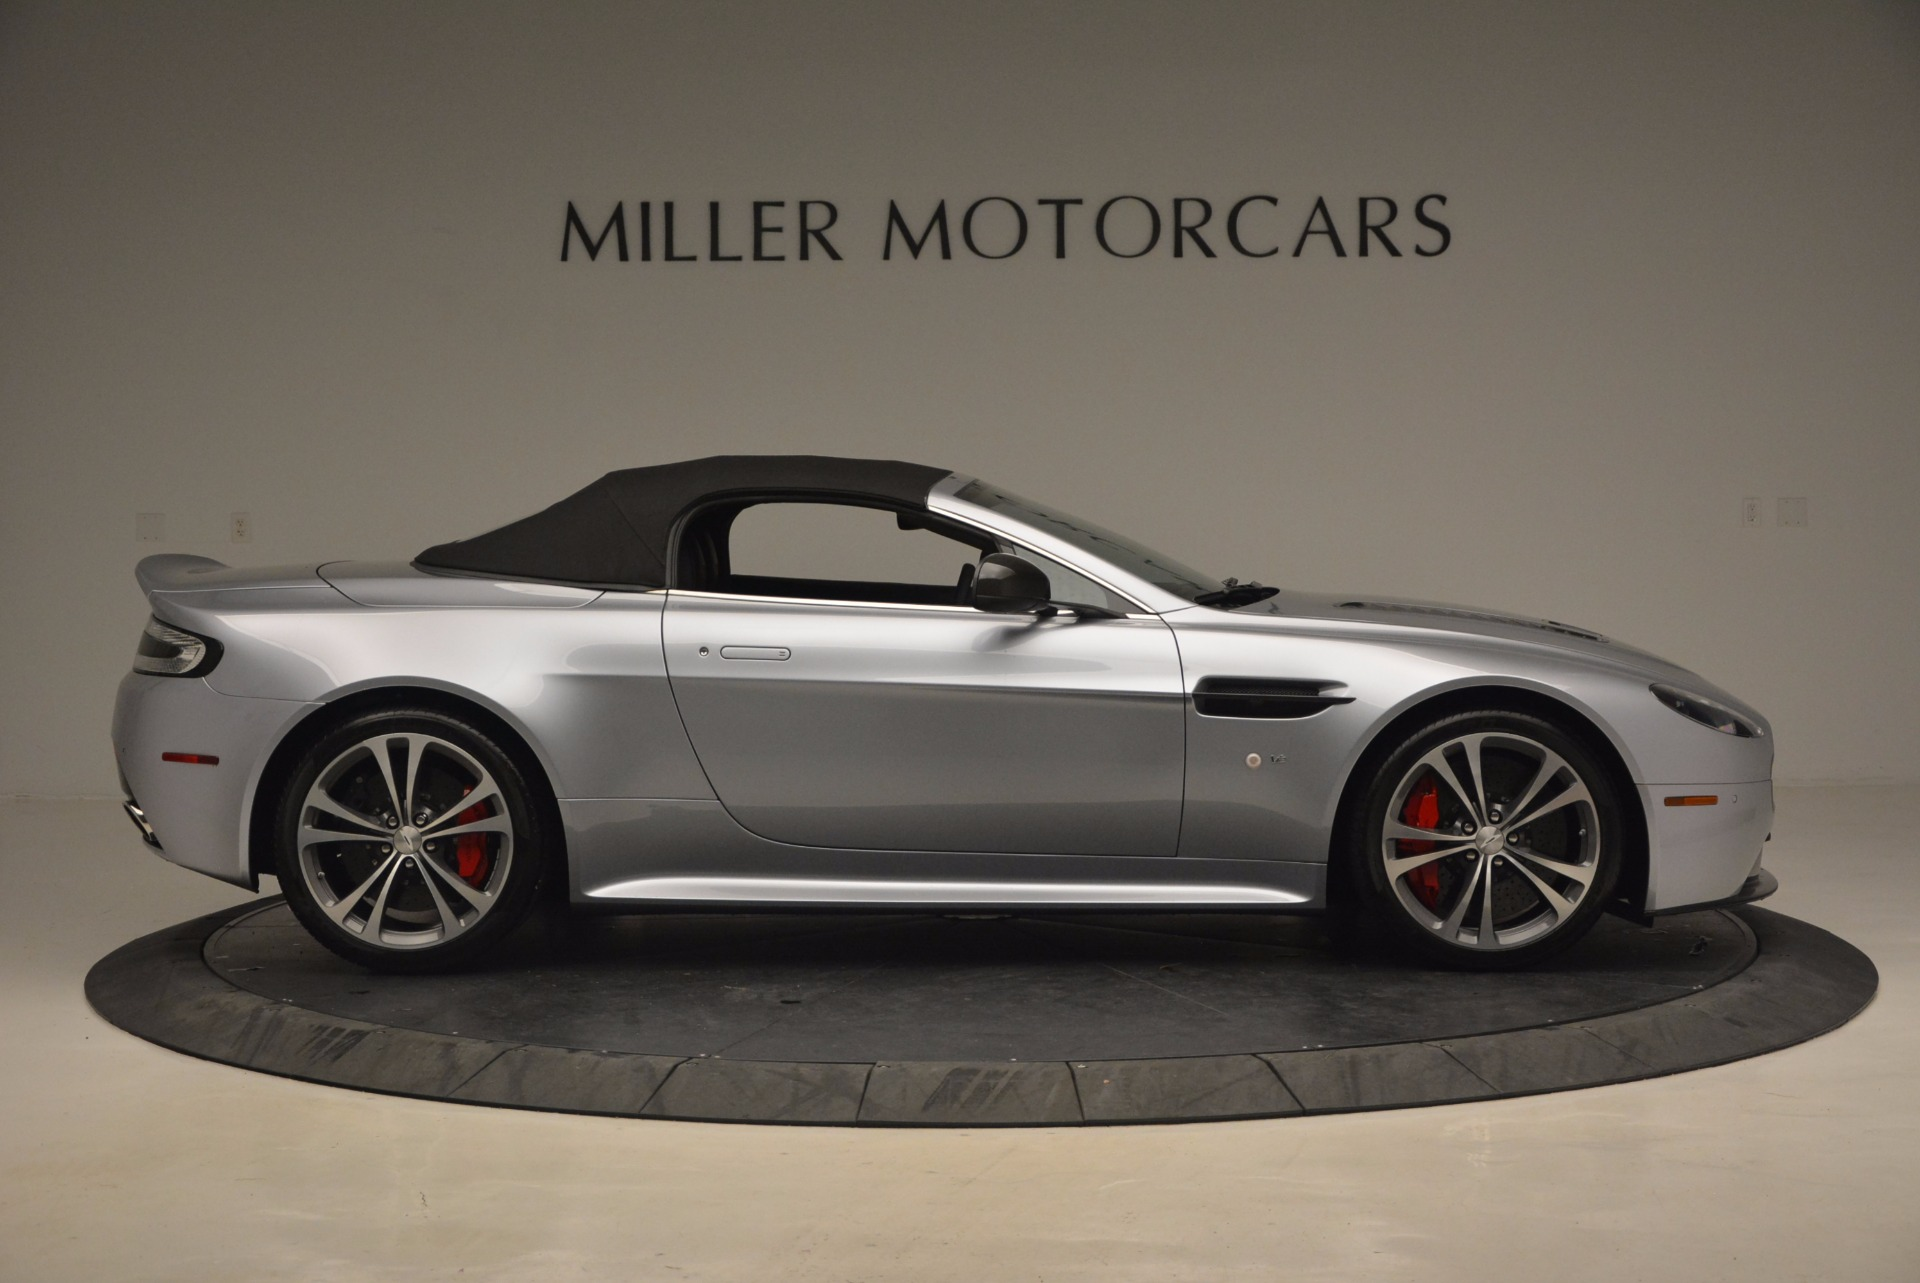 Used 2015 Aston Martin V12 Vantage S Roadster For Sale In Westport, CT 1130_p21